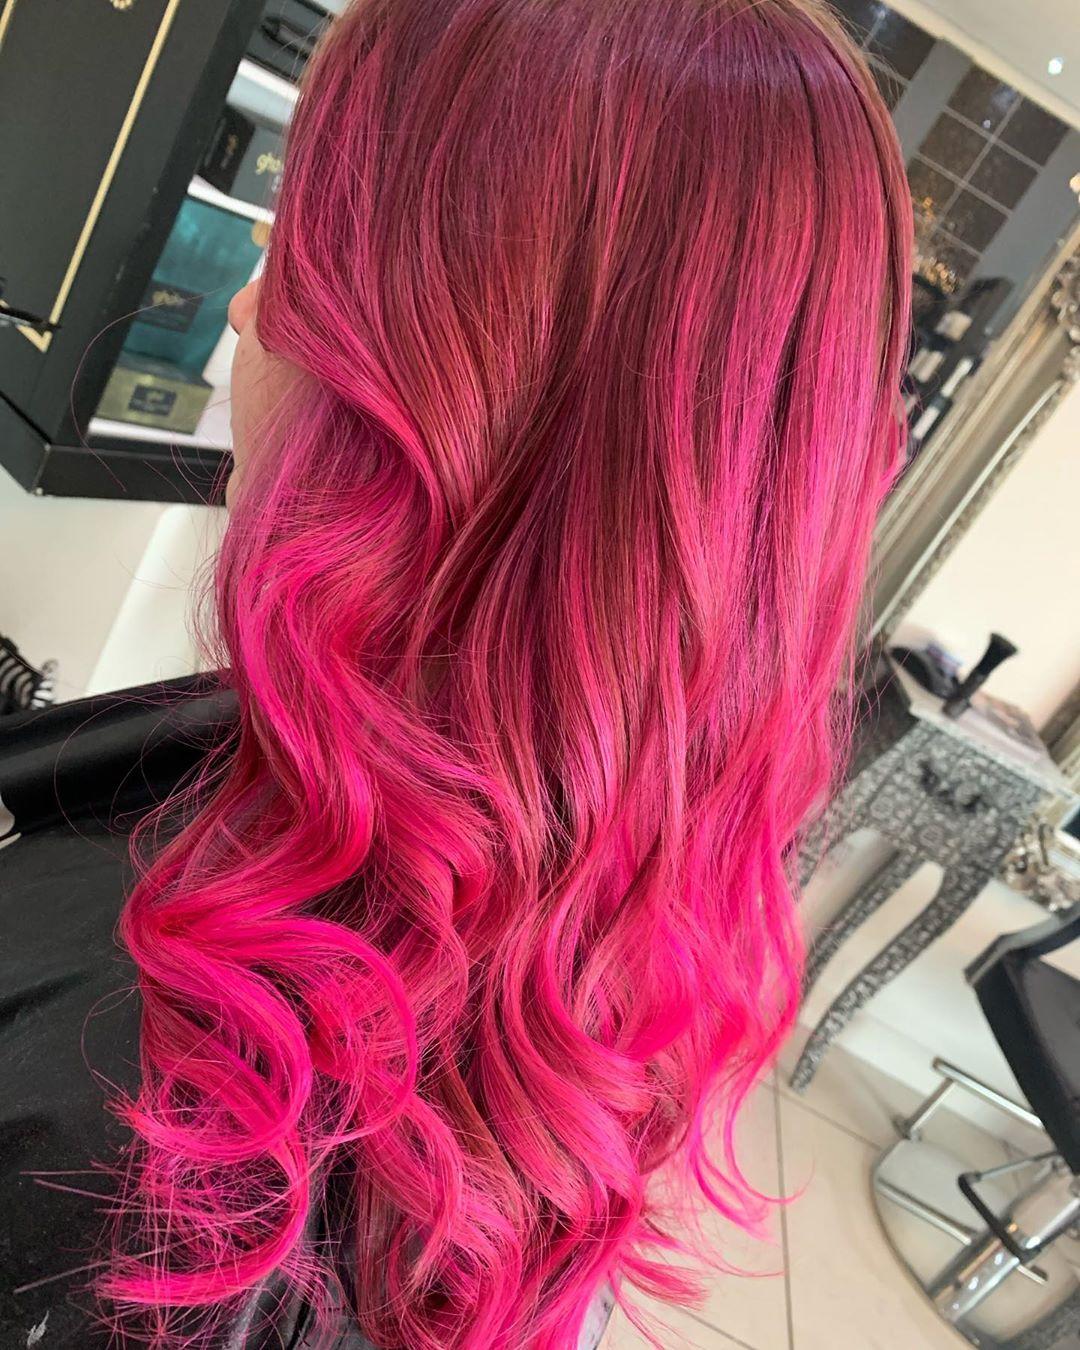 nmy hairstyles 118186181 158291042579708 3788442725309131932 n - Cores de Cabelo 2021 – Principais Tendências